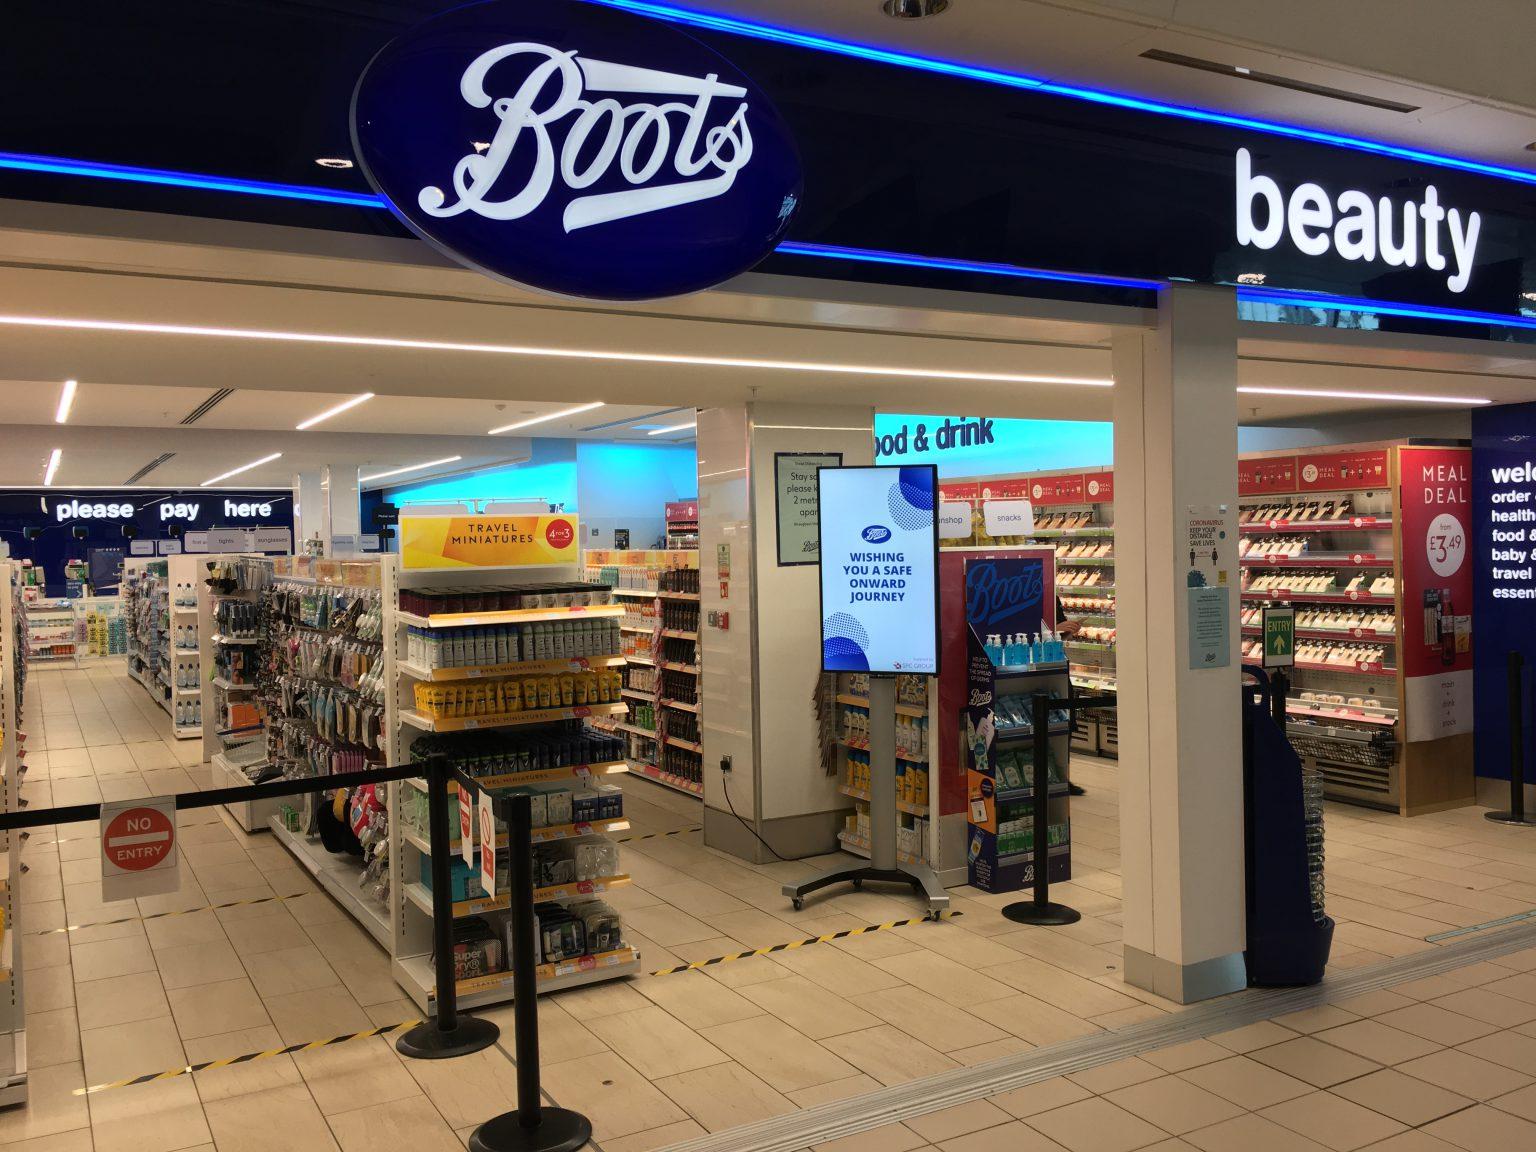 Digital sigange at Boots at London Luton Airport